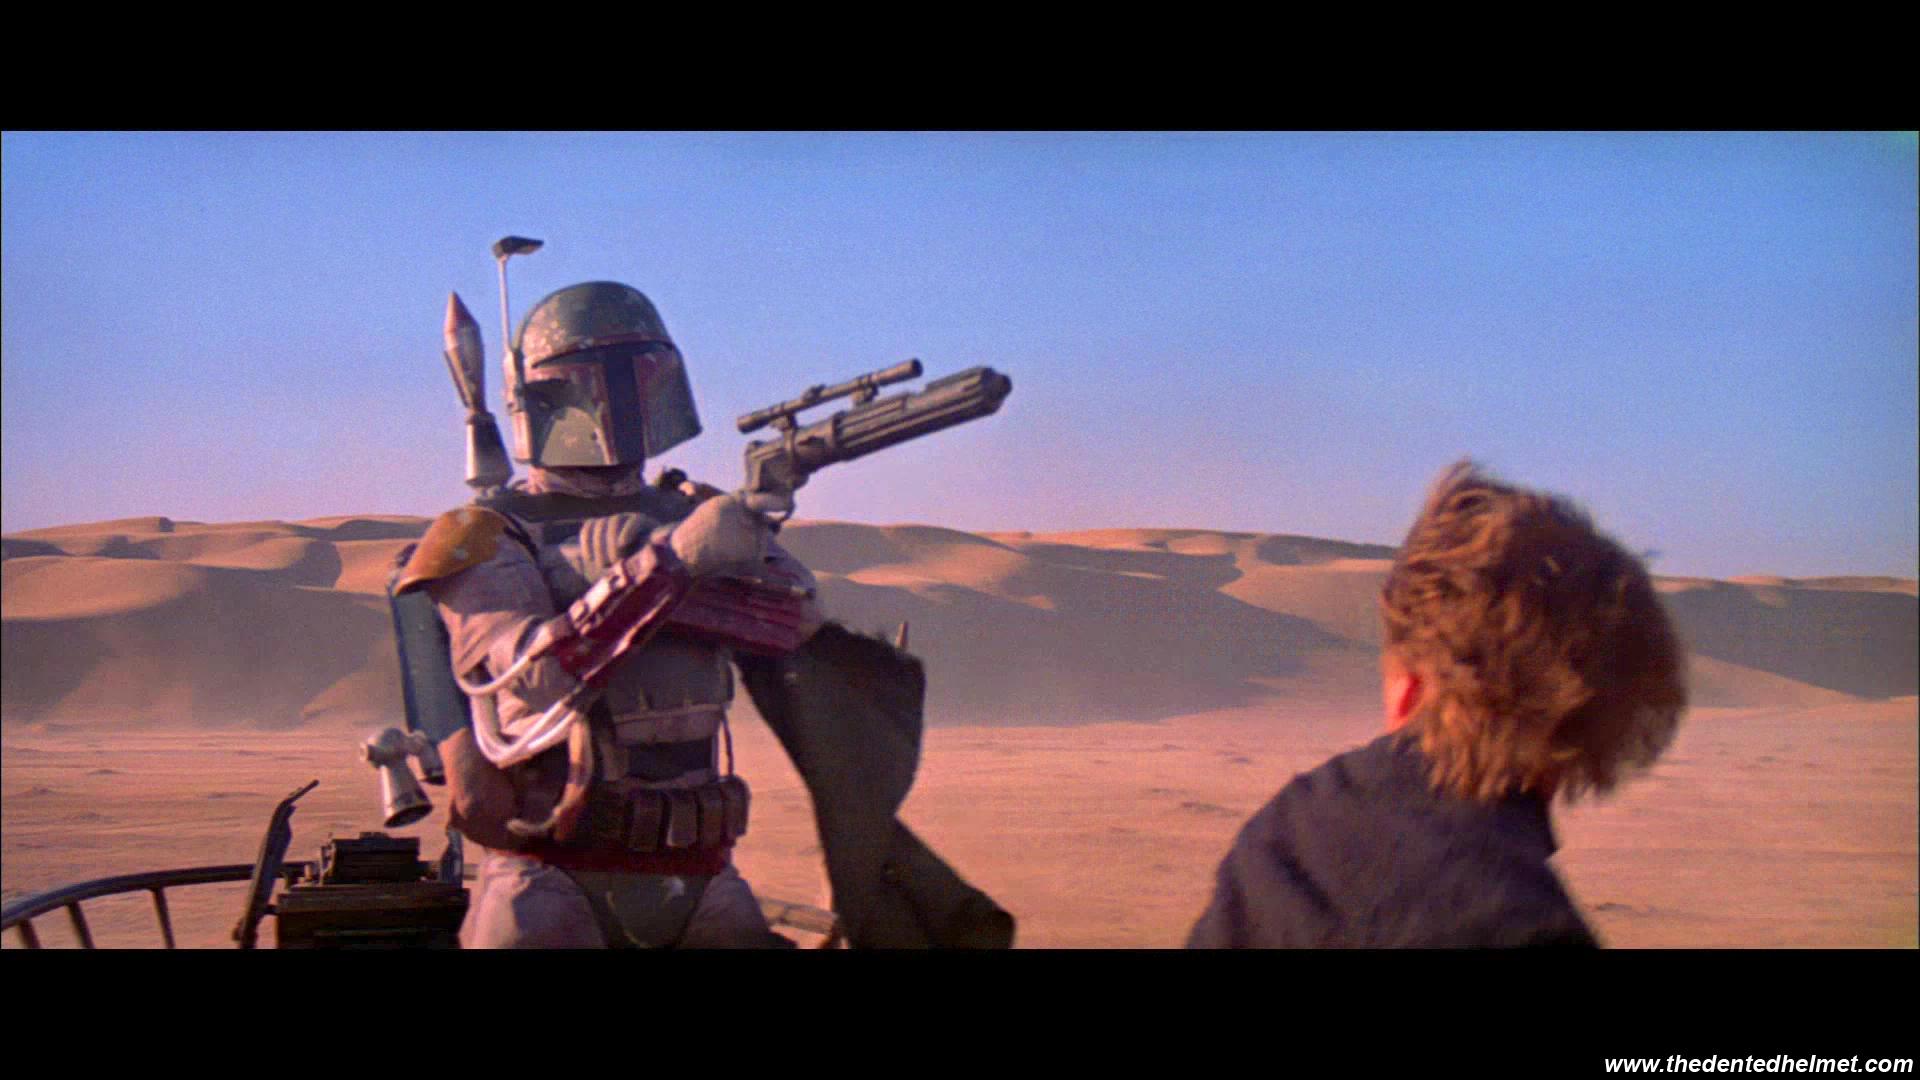 Boba-Fett-Costume-Returnof-the-Jedi-HD-061.png